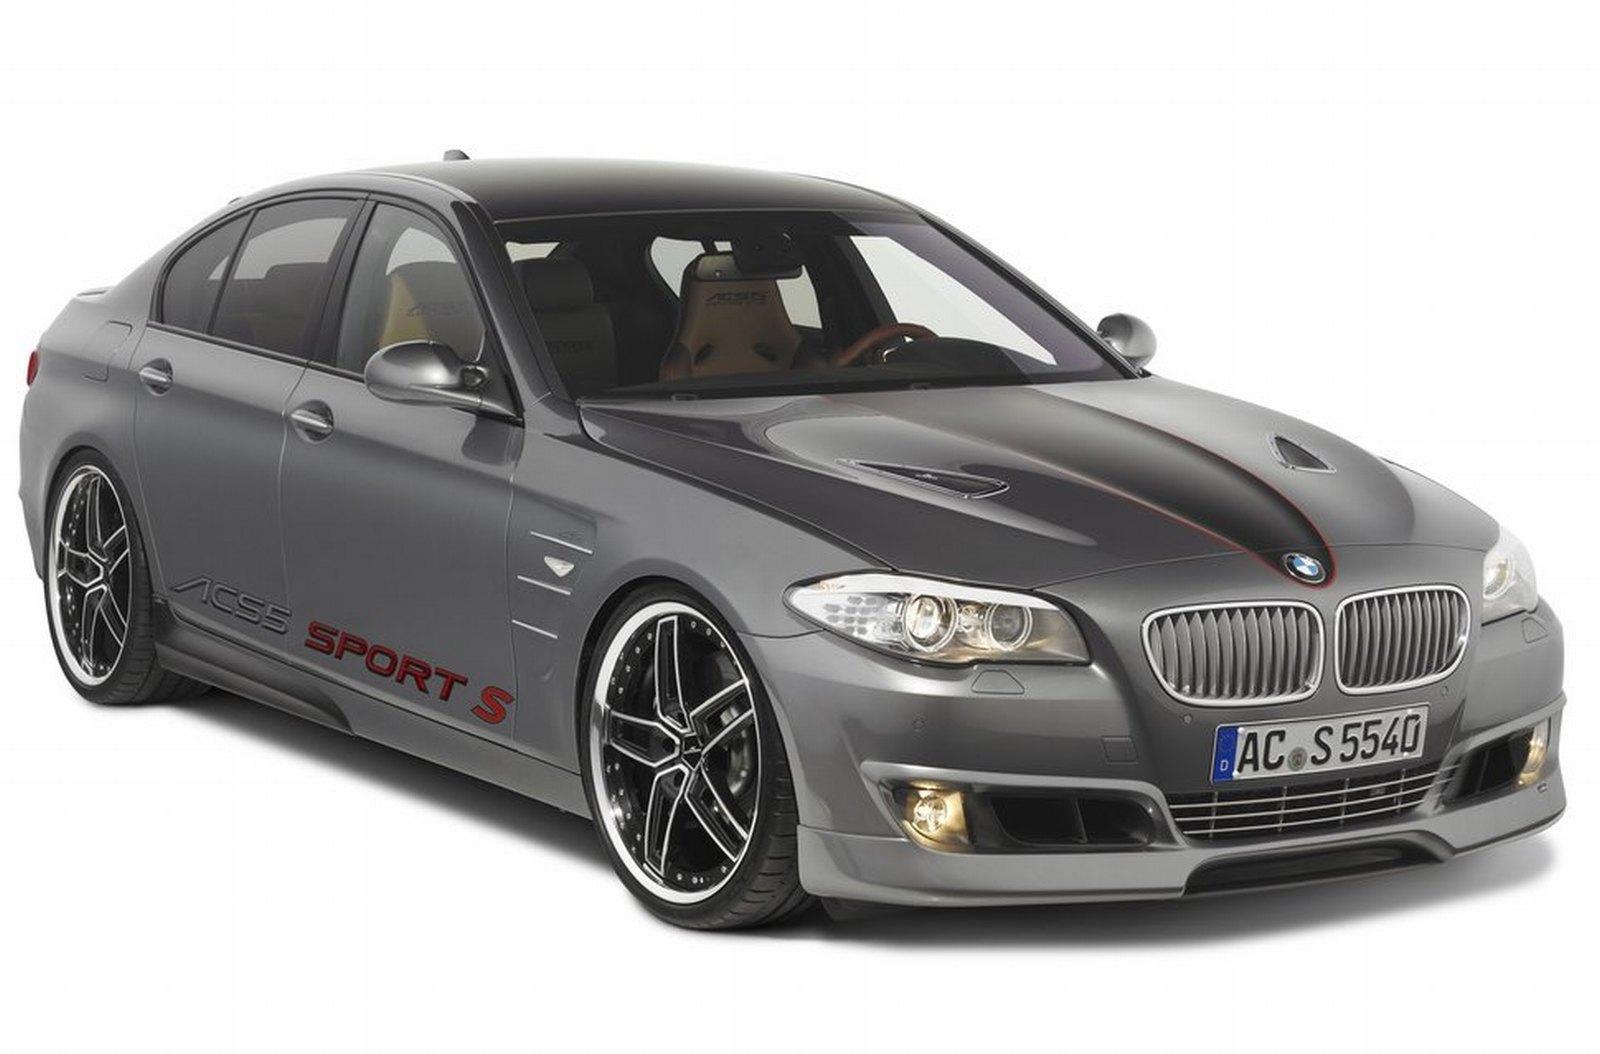 2011 ac schnitzer acs5 sport s concept cars sketches. Black Bedroom Furniture Sets. Home Design Ideas